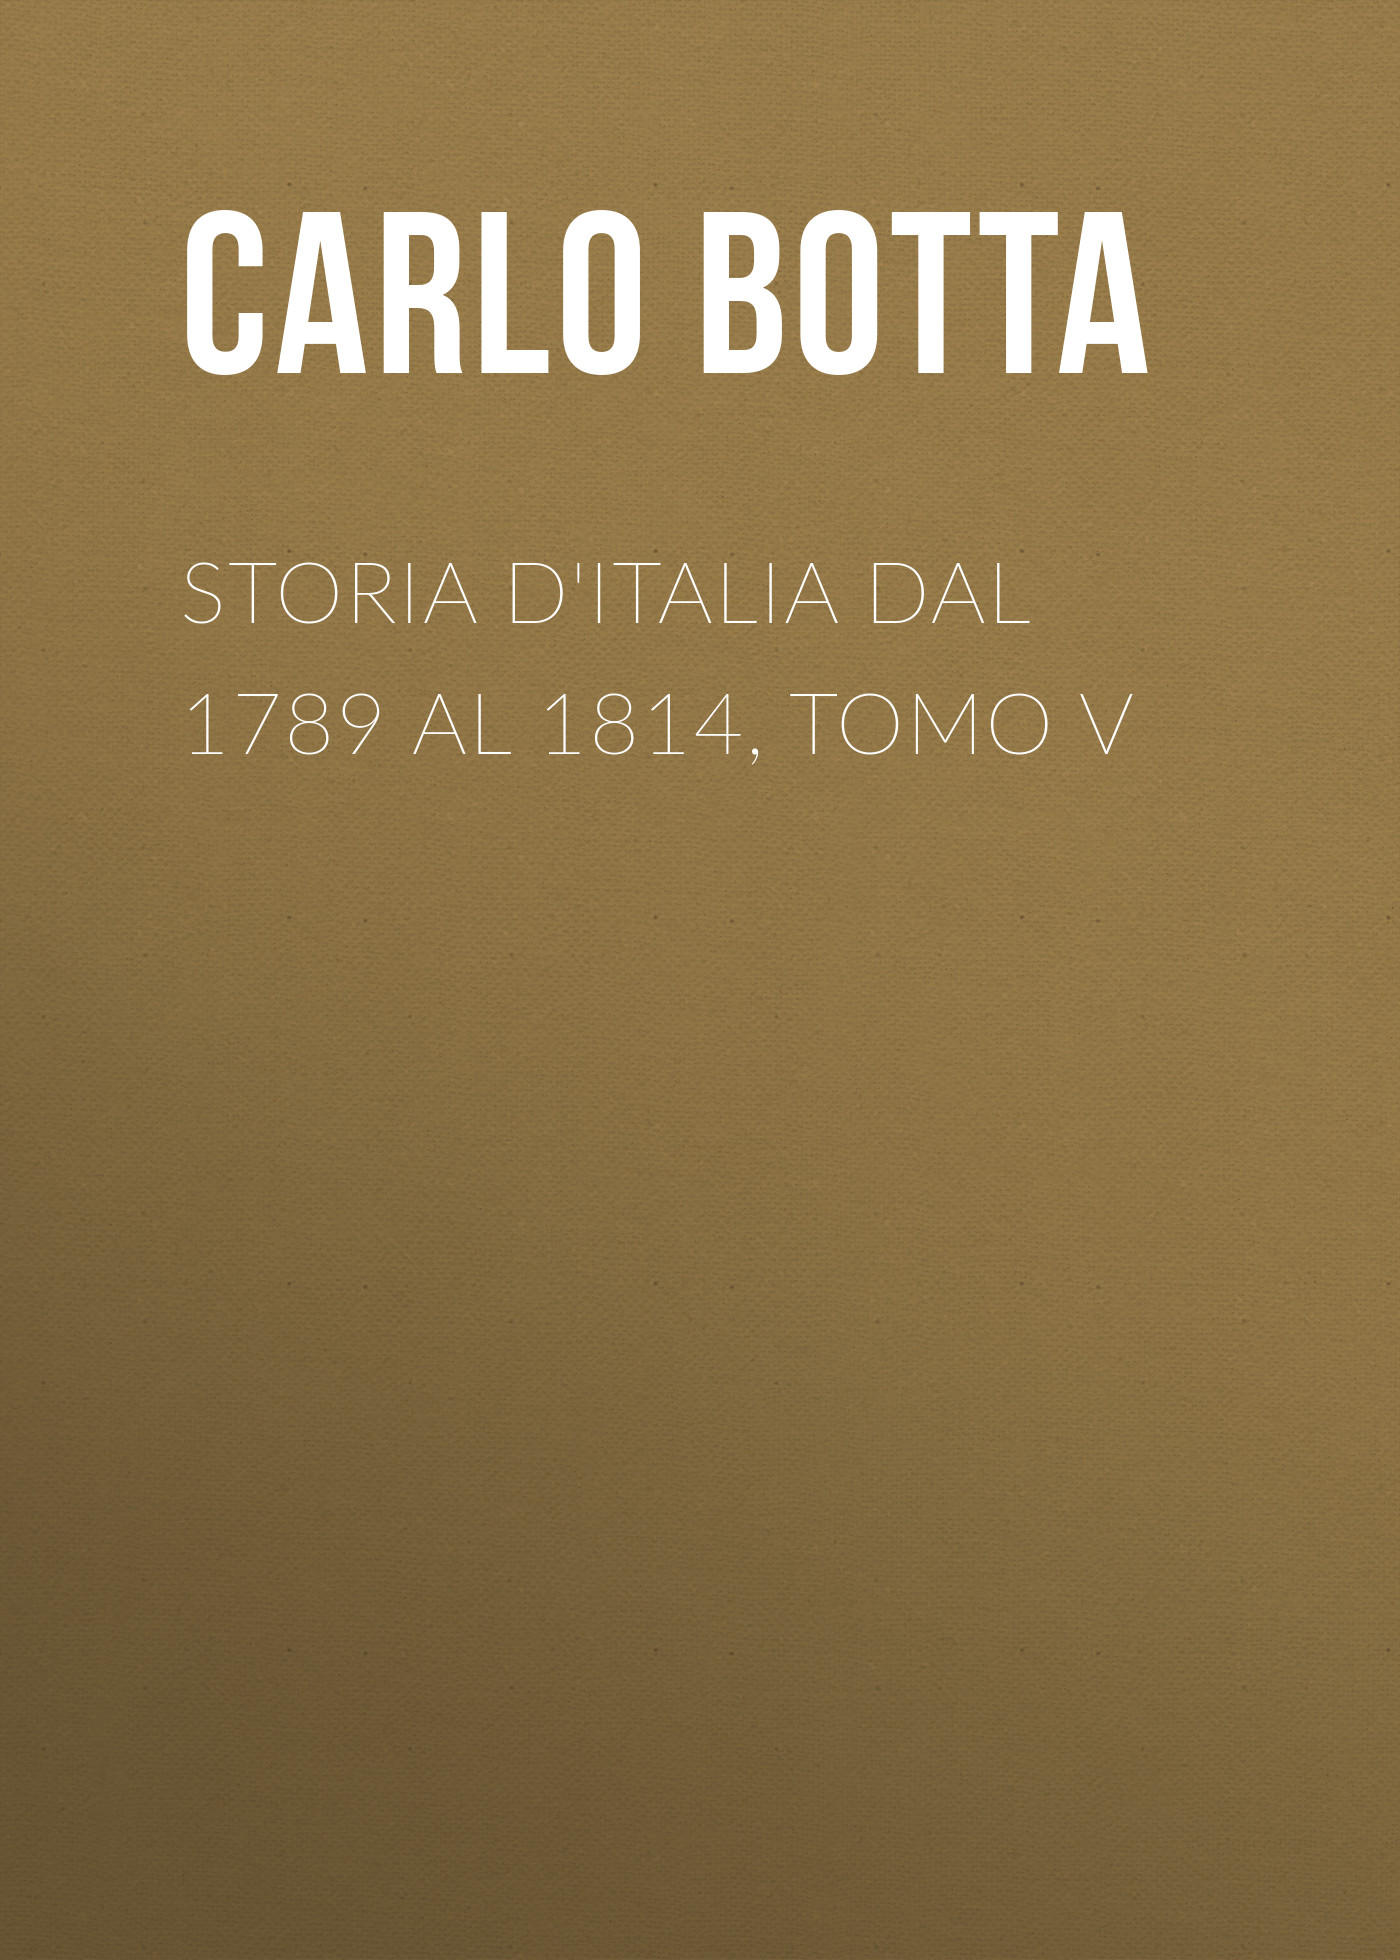 Botta Carlo Storia d'Italia dal 1789 al 1814, tomo V charles botta histoire d italie de 1789 a 1814 t 3